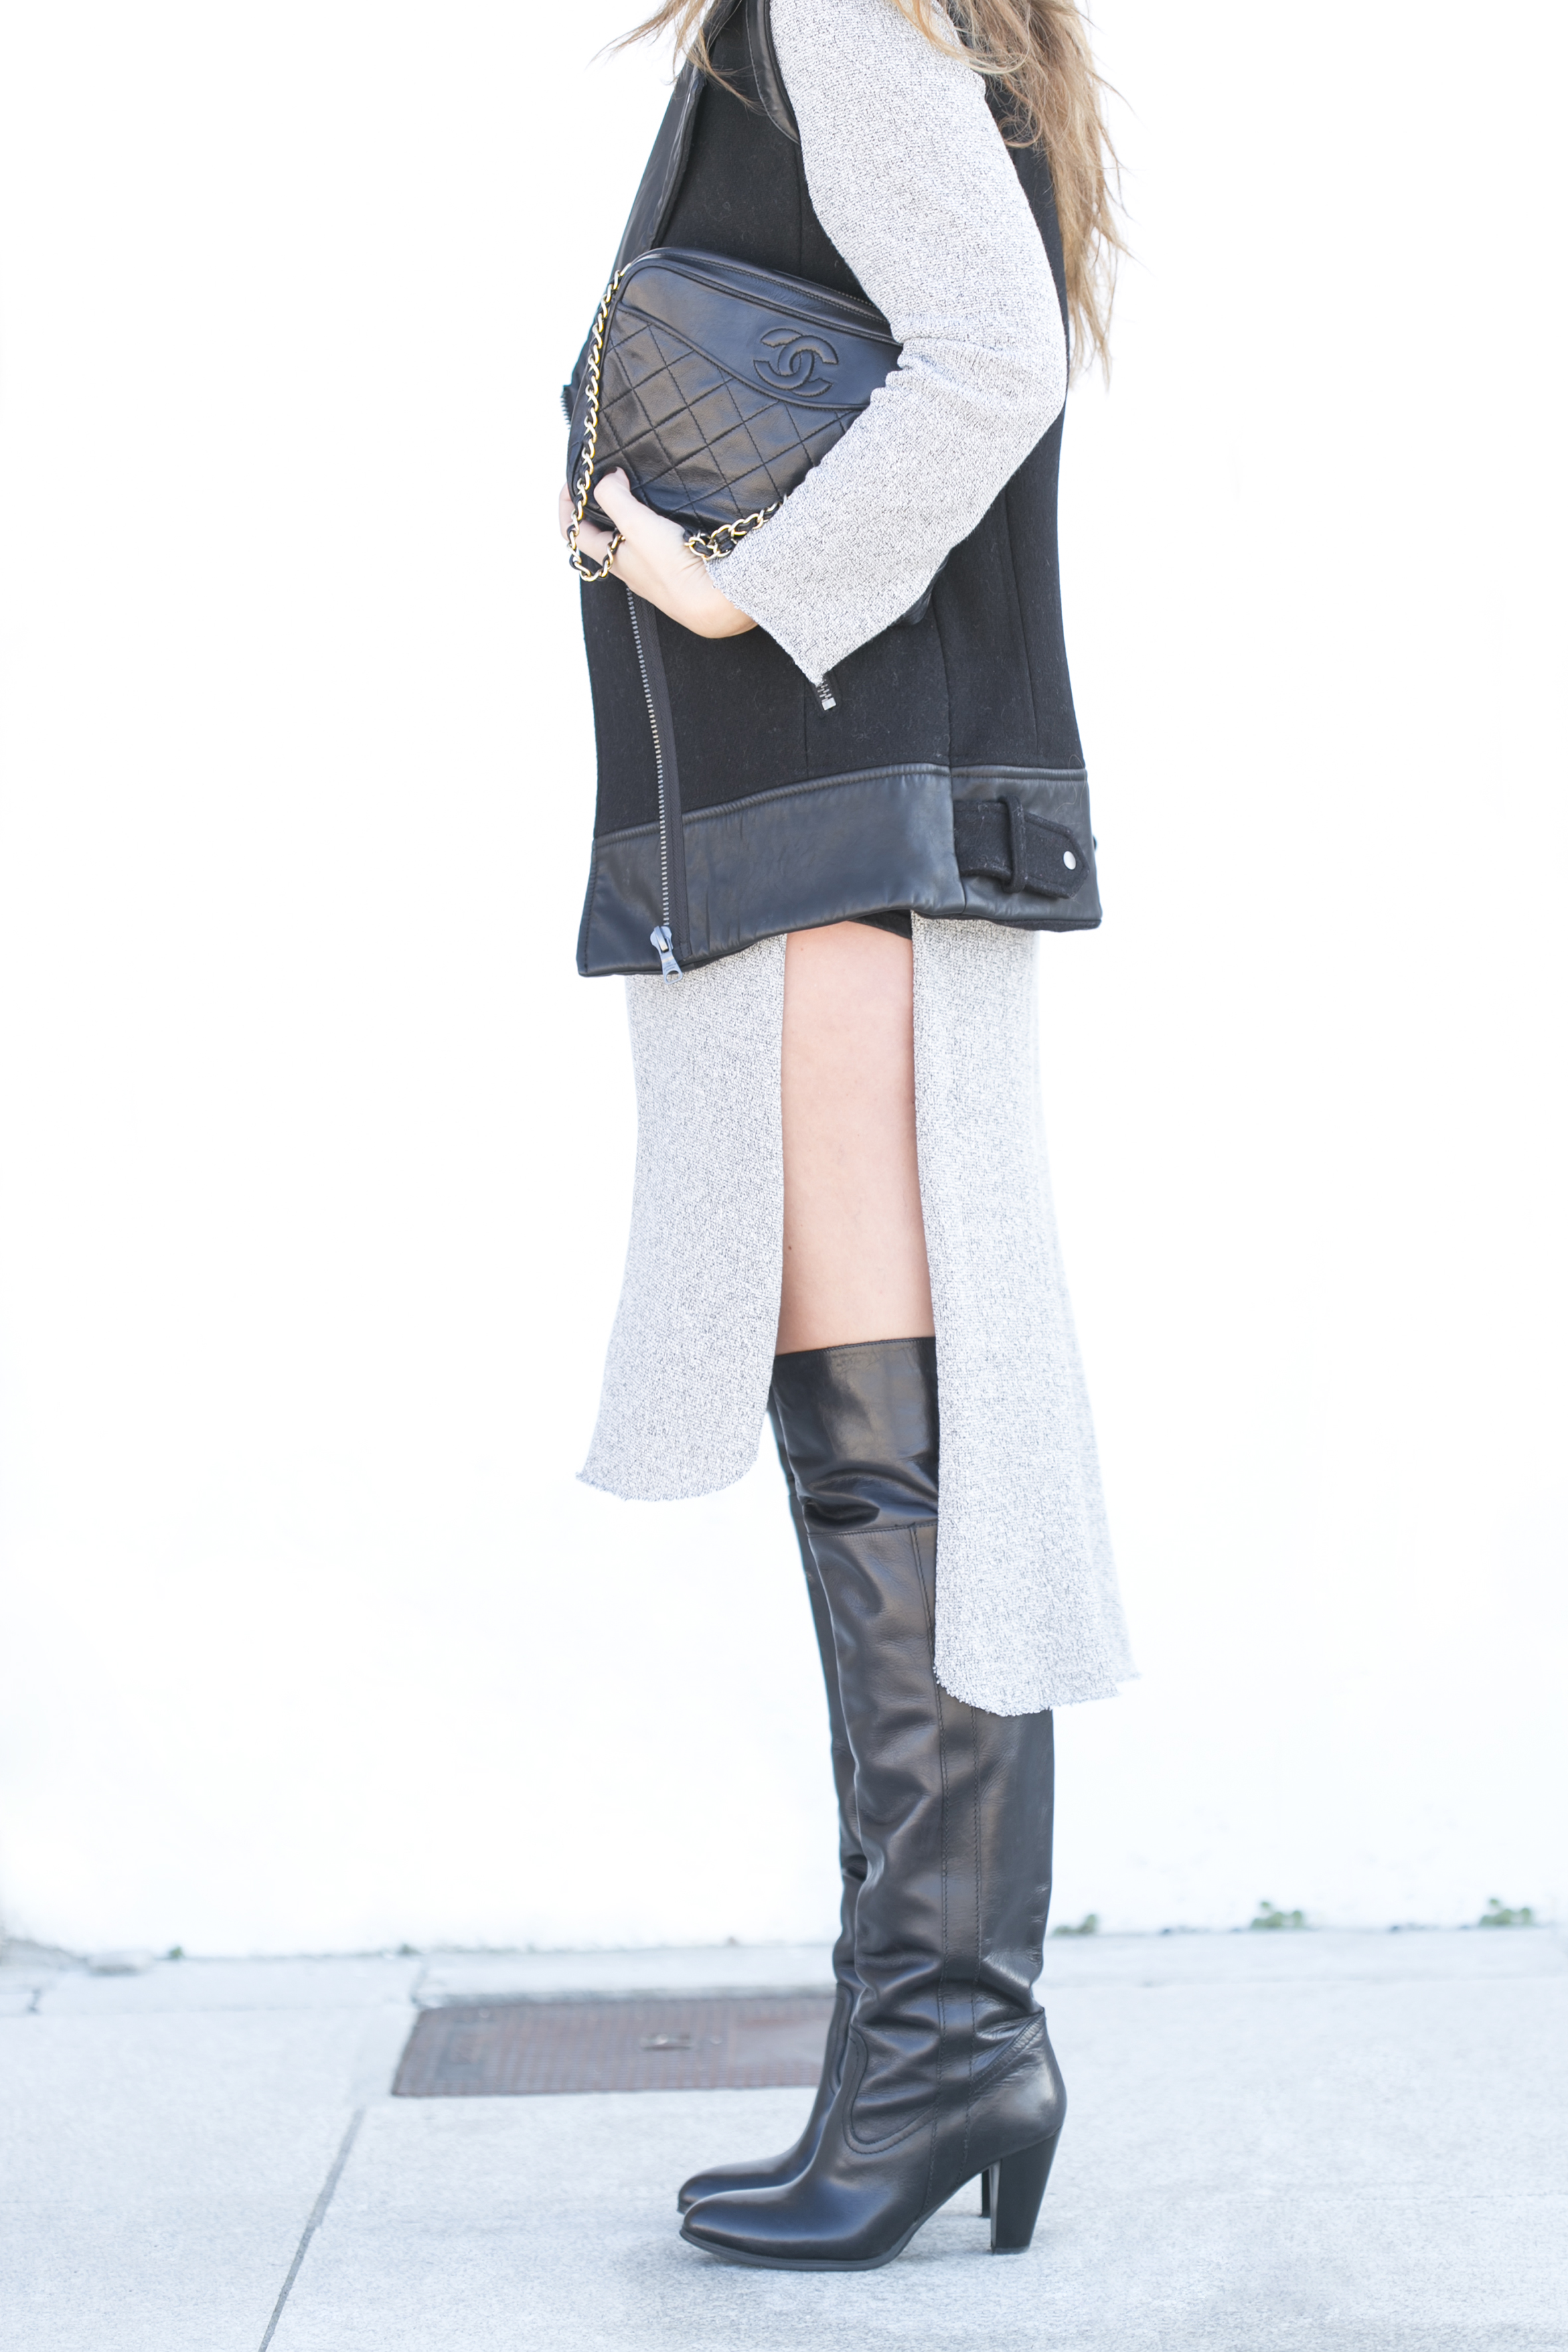 chanel-vintage-blogger-fashion-style-street-zara-Krack-boots-mosqueteras-descalzaporelparque